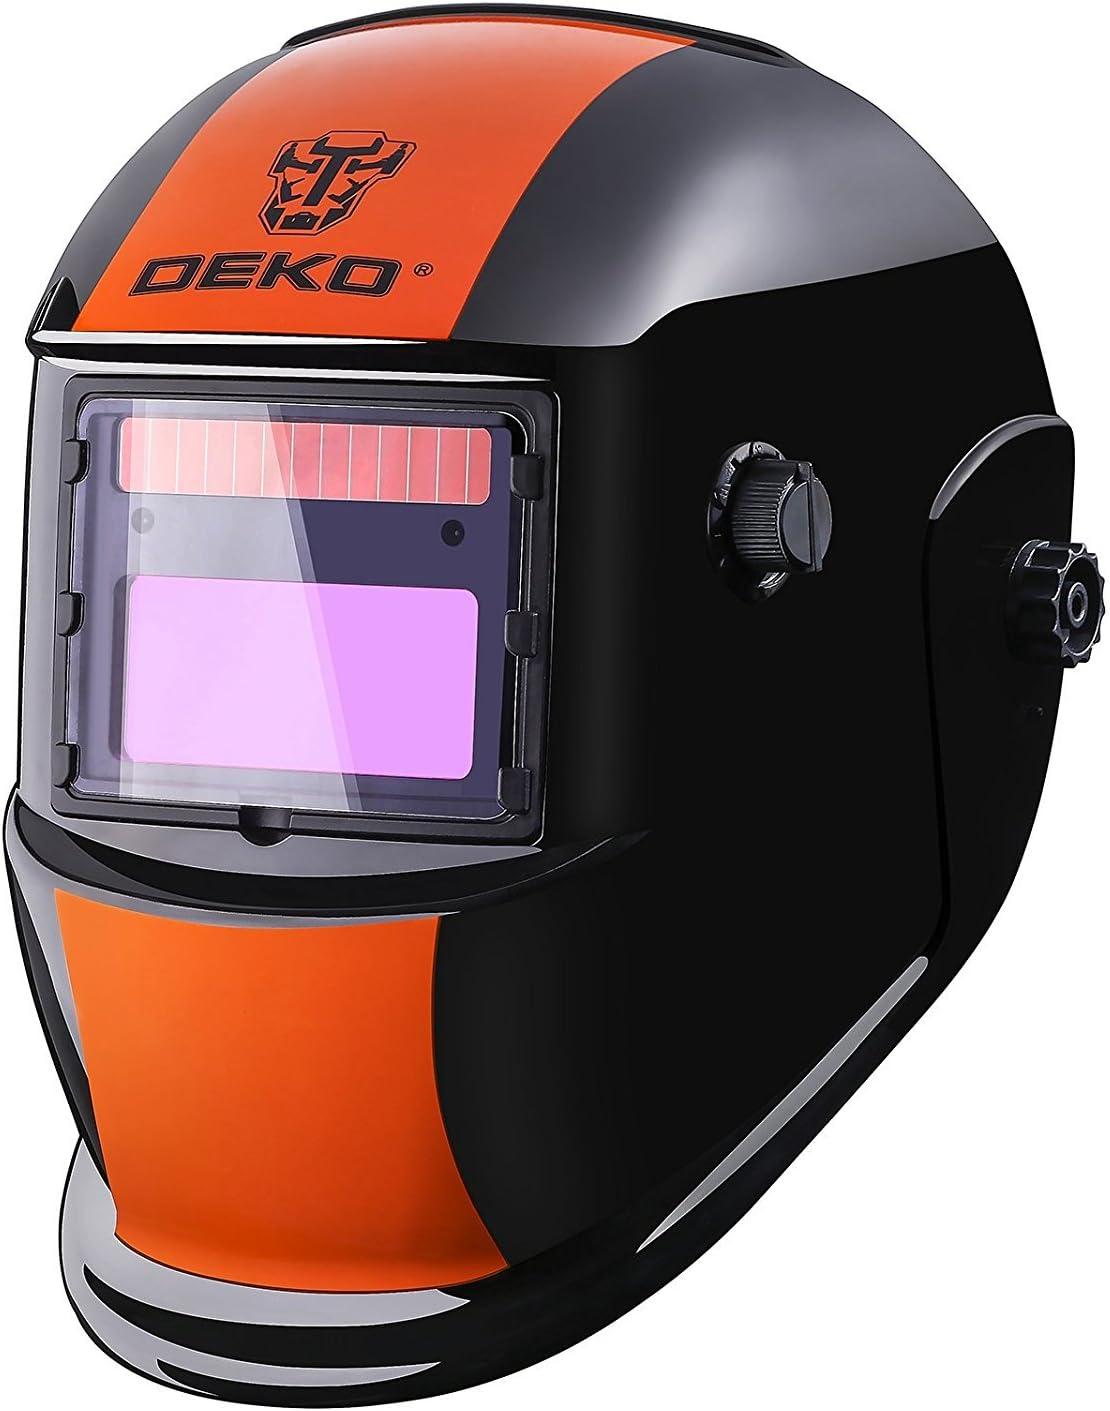 DEKOPRO Welding Helmet Solar Powered Auto Darkening Hood with Adjustable Shade Range 4//9-13 for Mig Tig Arc Welder Mask Shield Flaming Skull Design